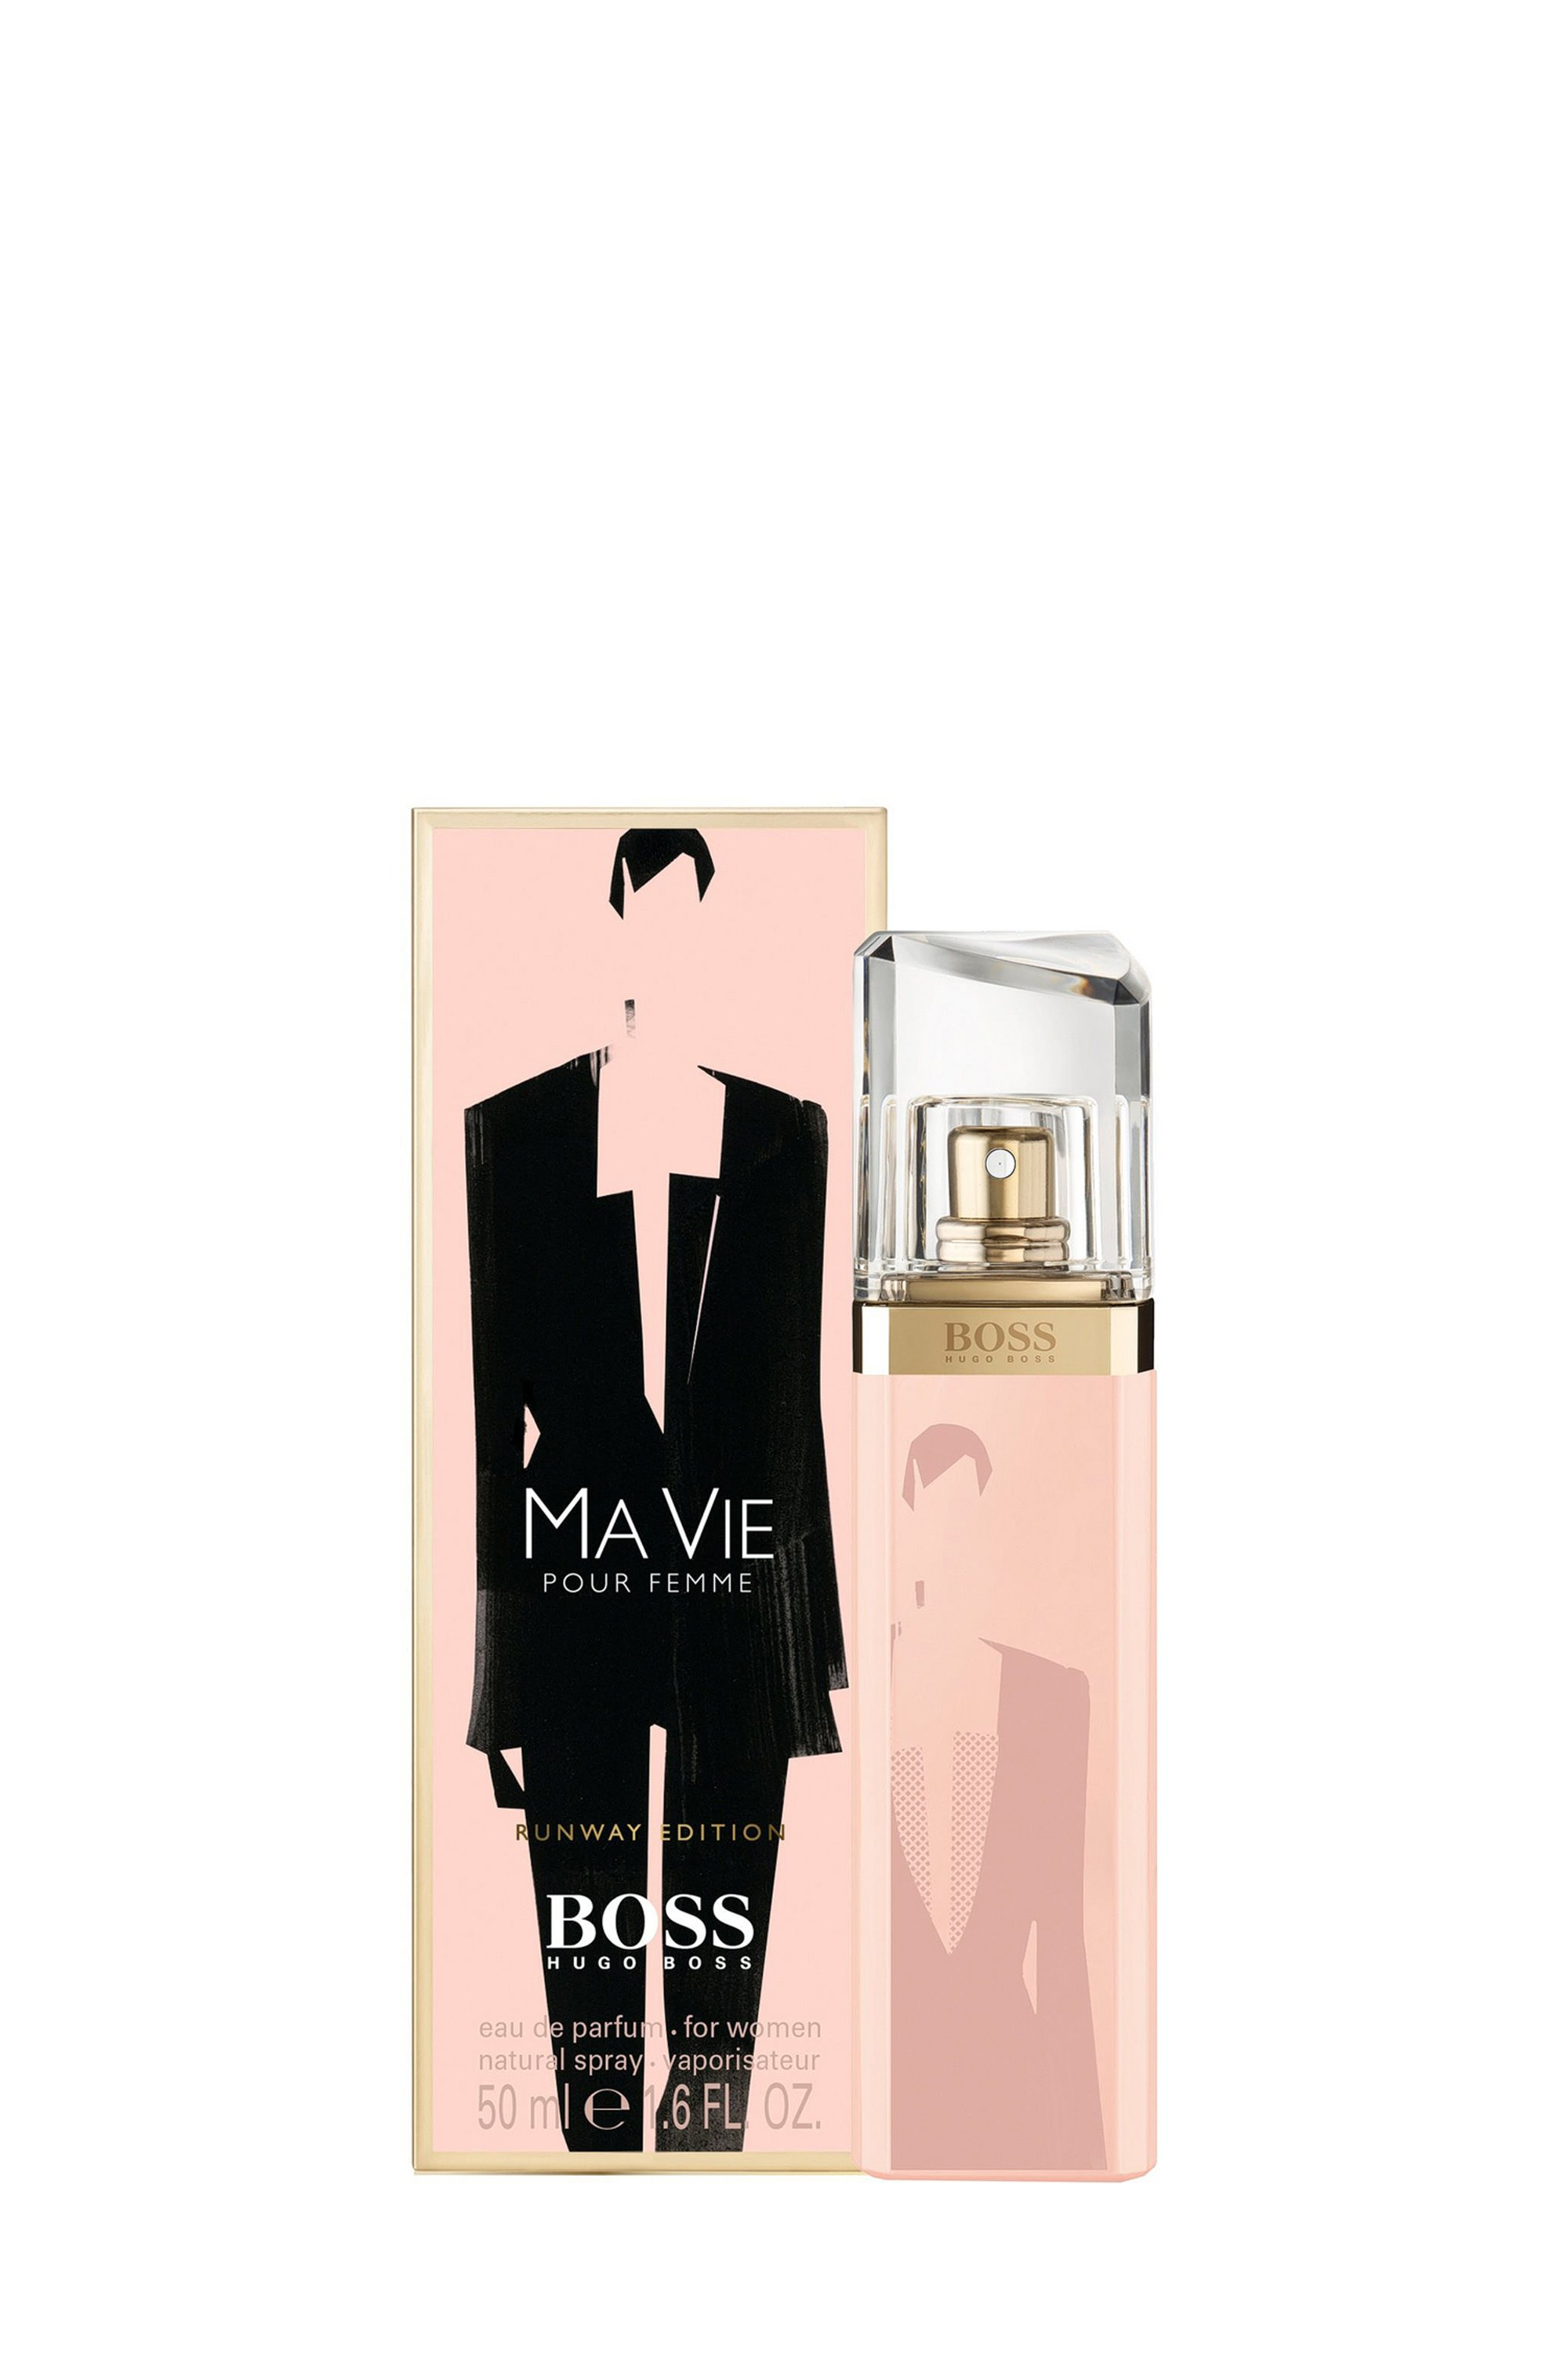 Eau de parfum BOSS Ma Vie Runway Edition de 50ml